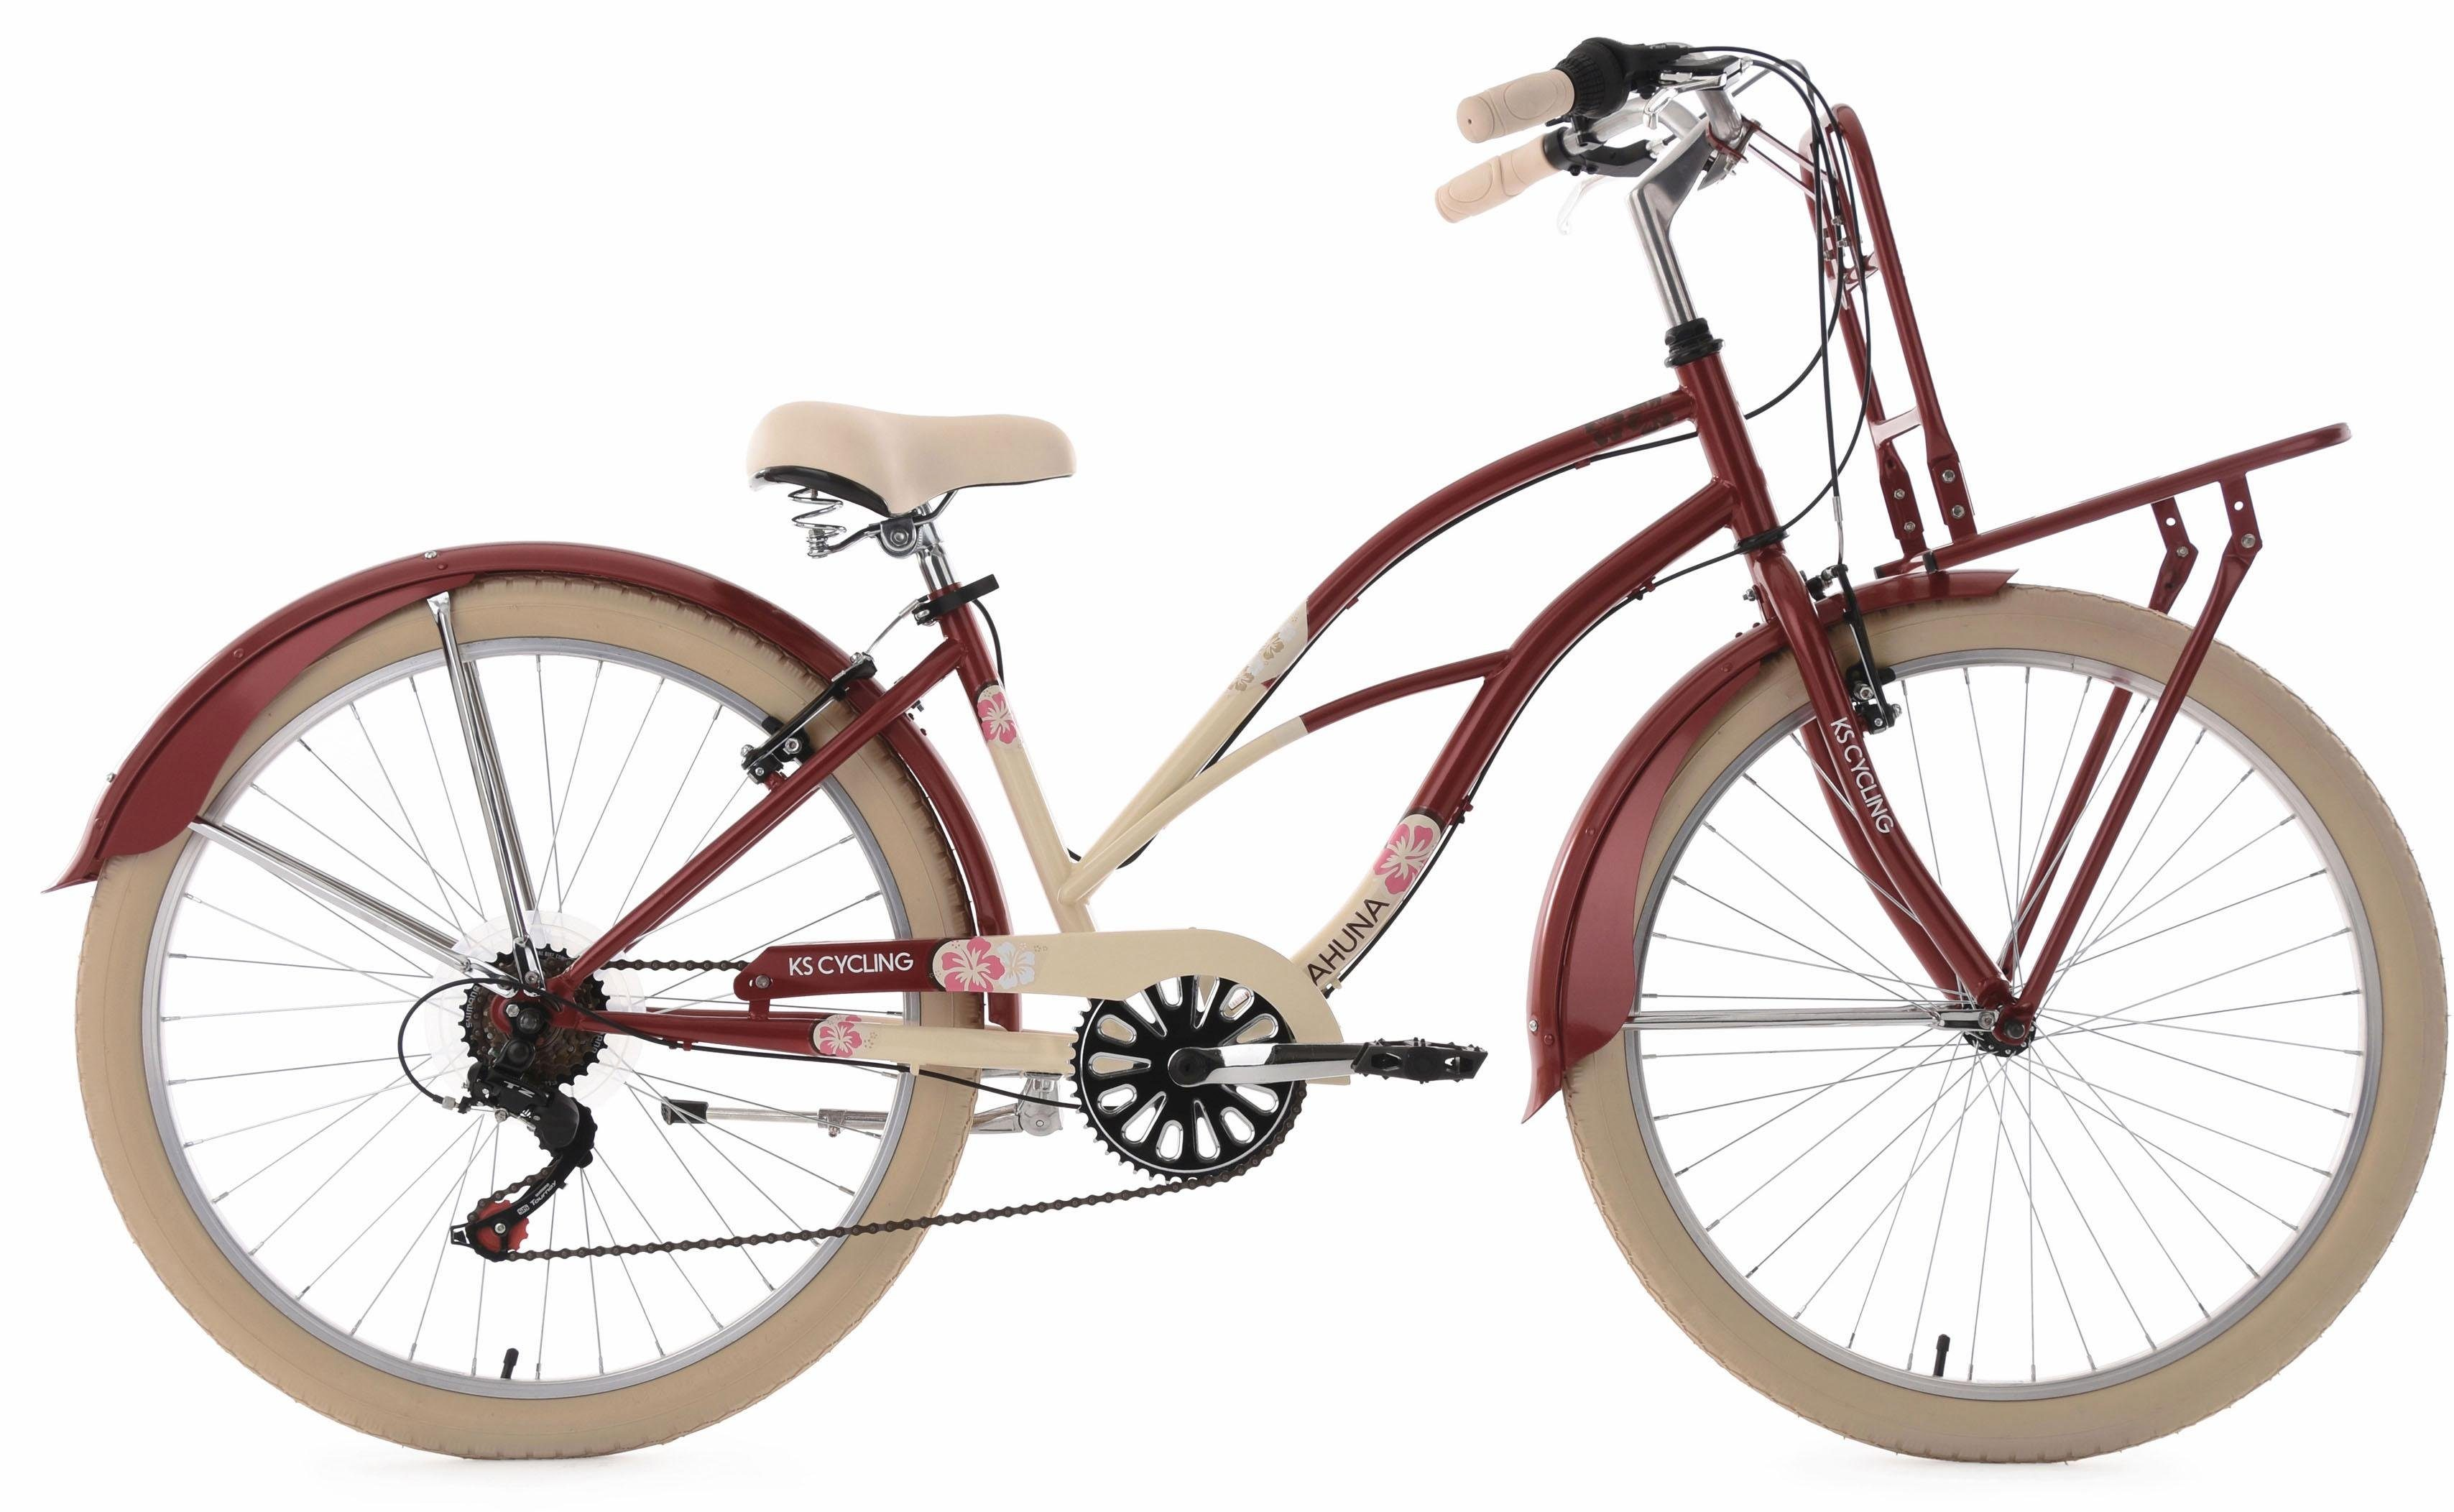 KS Cycling Beachcruiser, 26 Zoll, rot-beige, 6 Gang-Shimano Tourney Schaltwerk, »Kahuna«